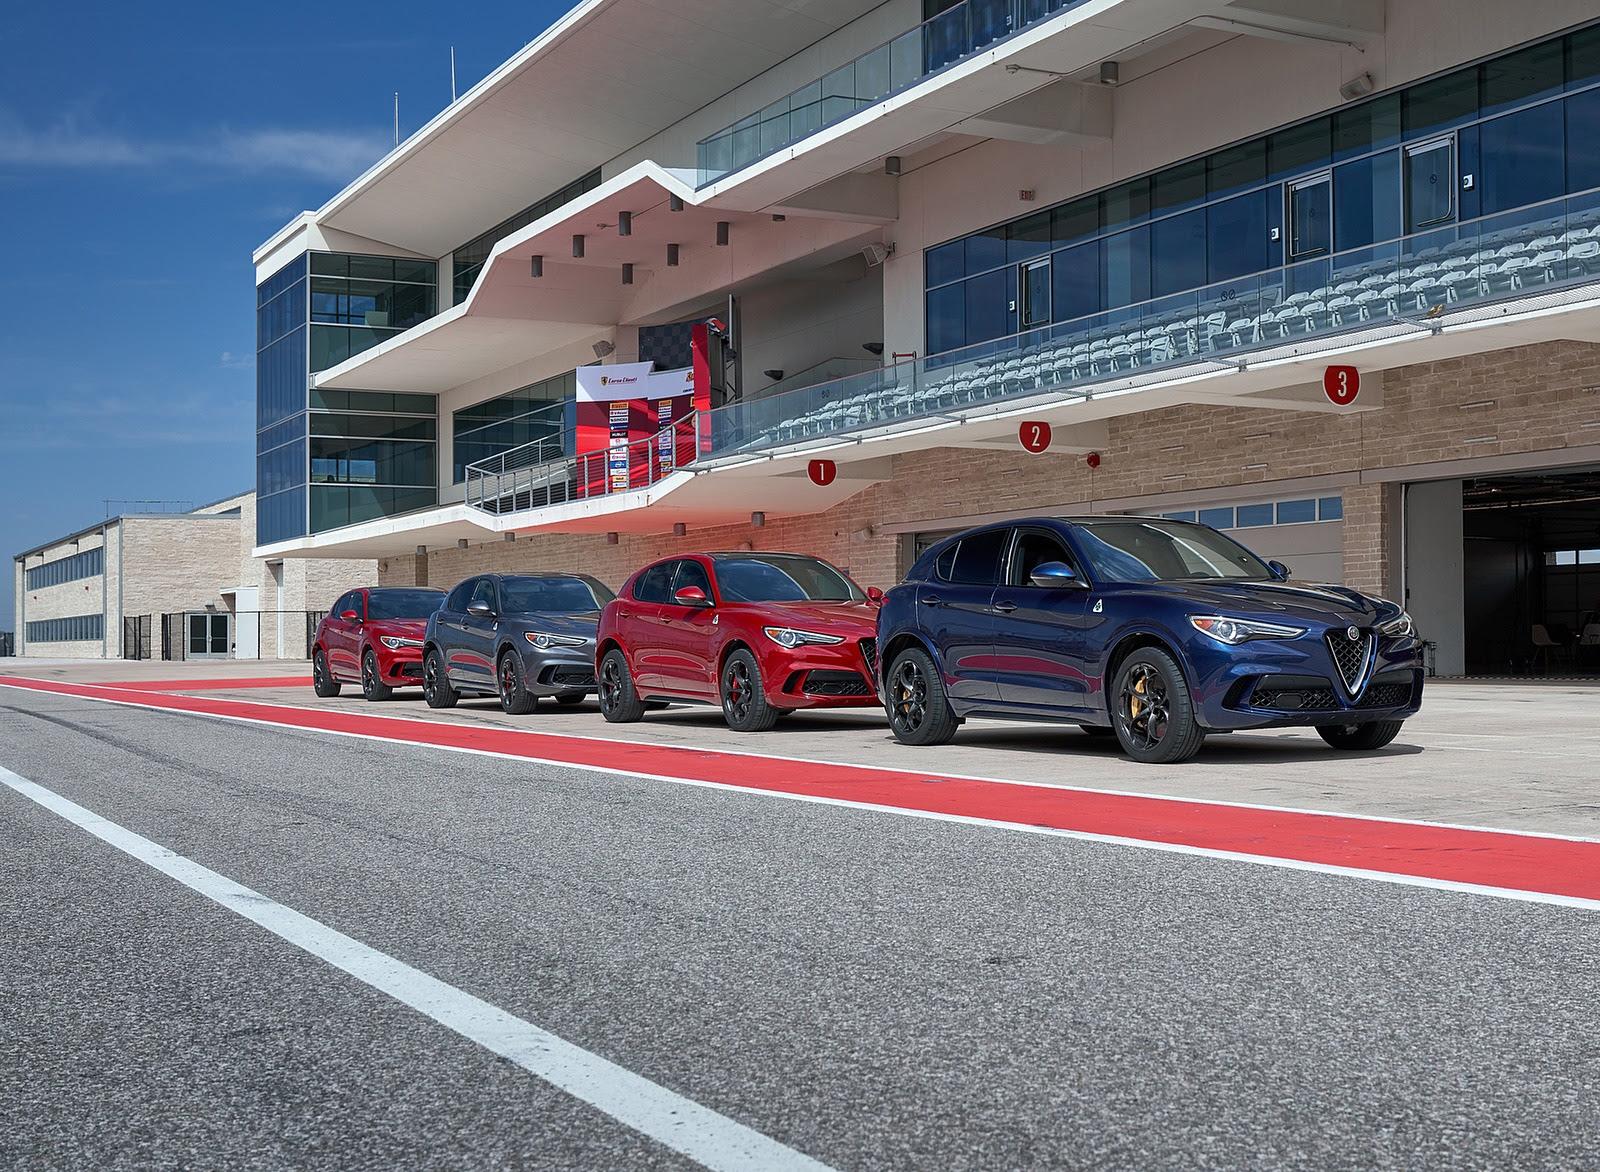 2018 Alfa Romeo Stelvio Quadrifoglio Wallpapers 87 Hd Images